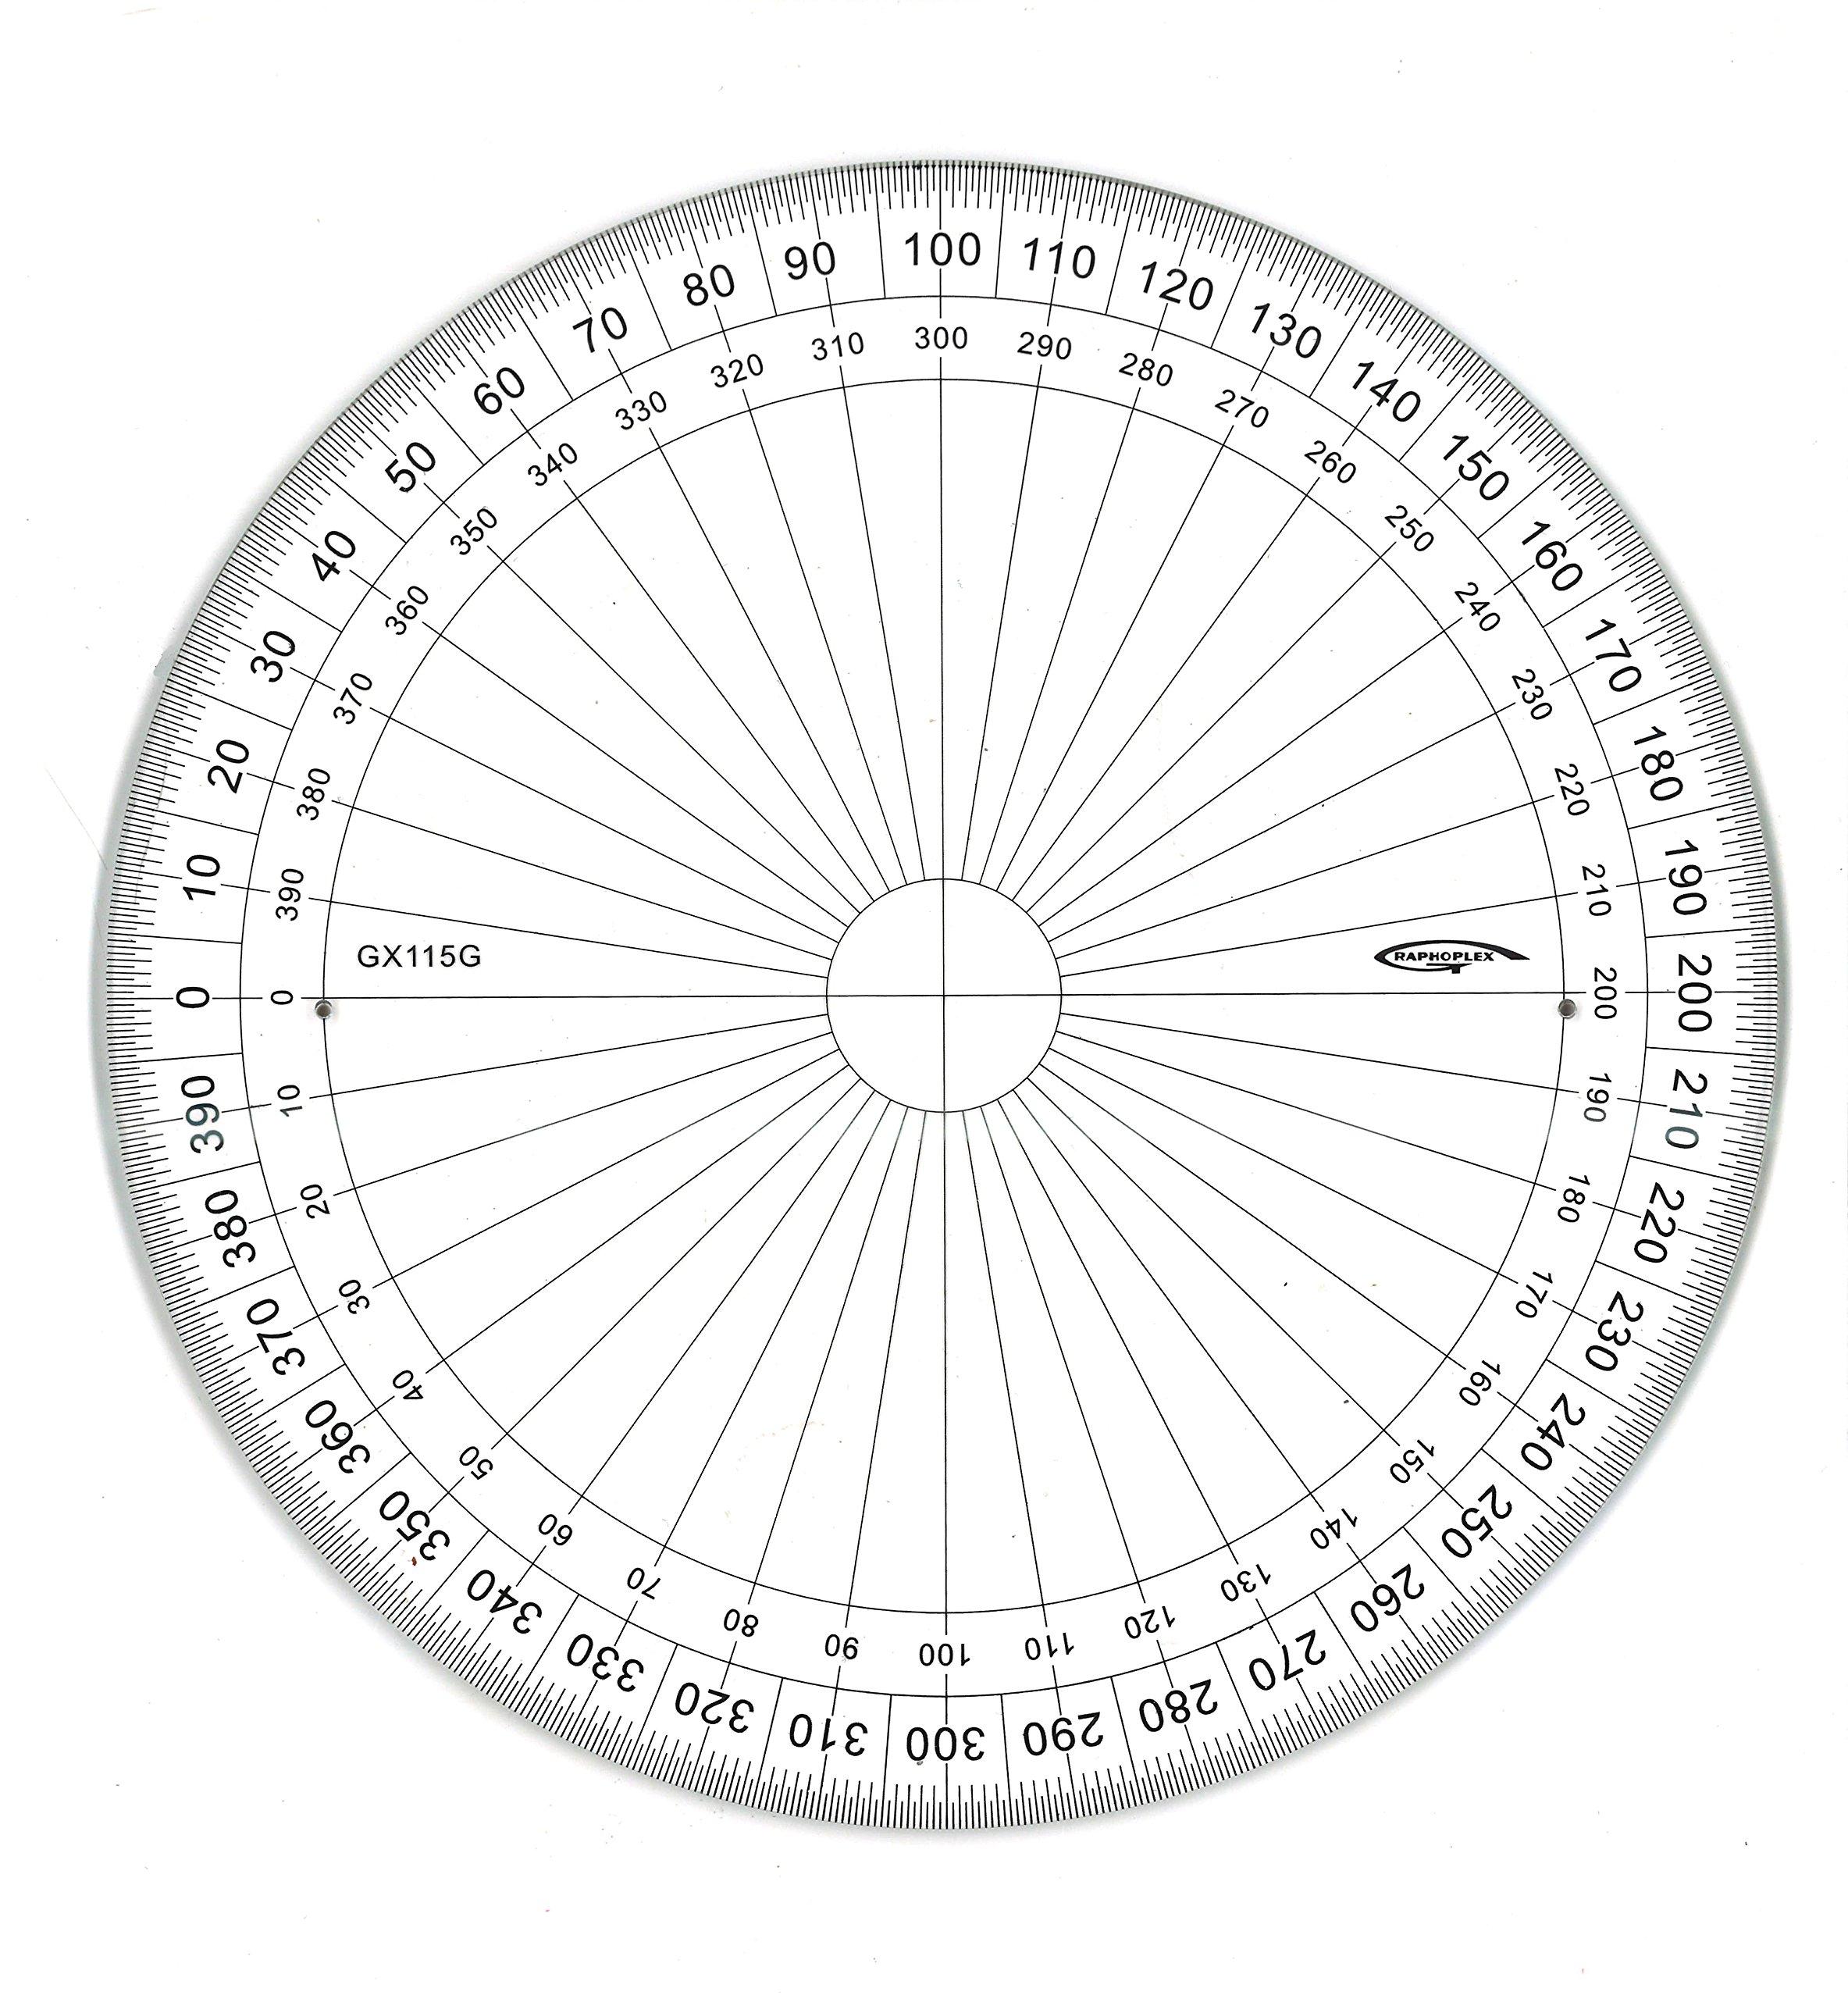 Graphoplex GX115G Full Circle Transparent Protractor